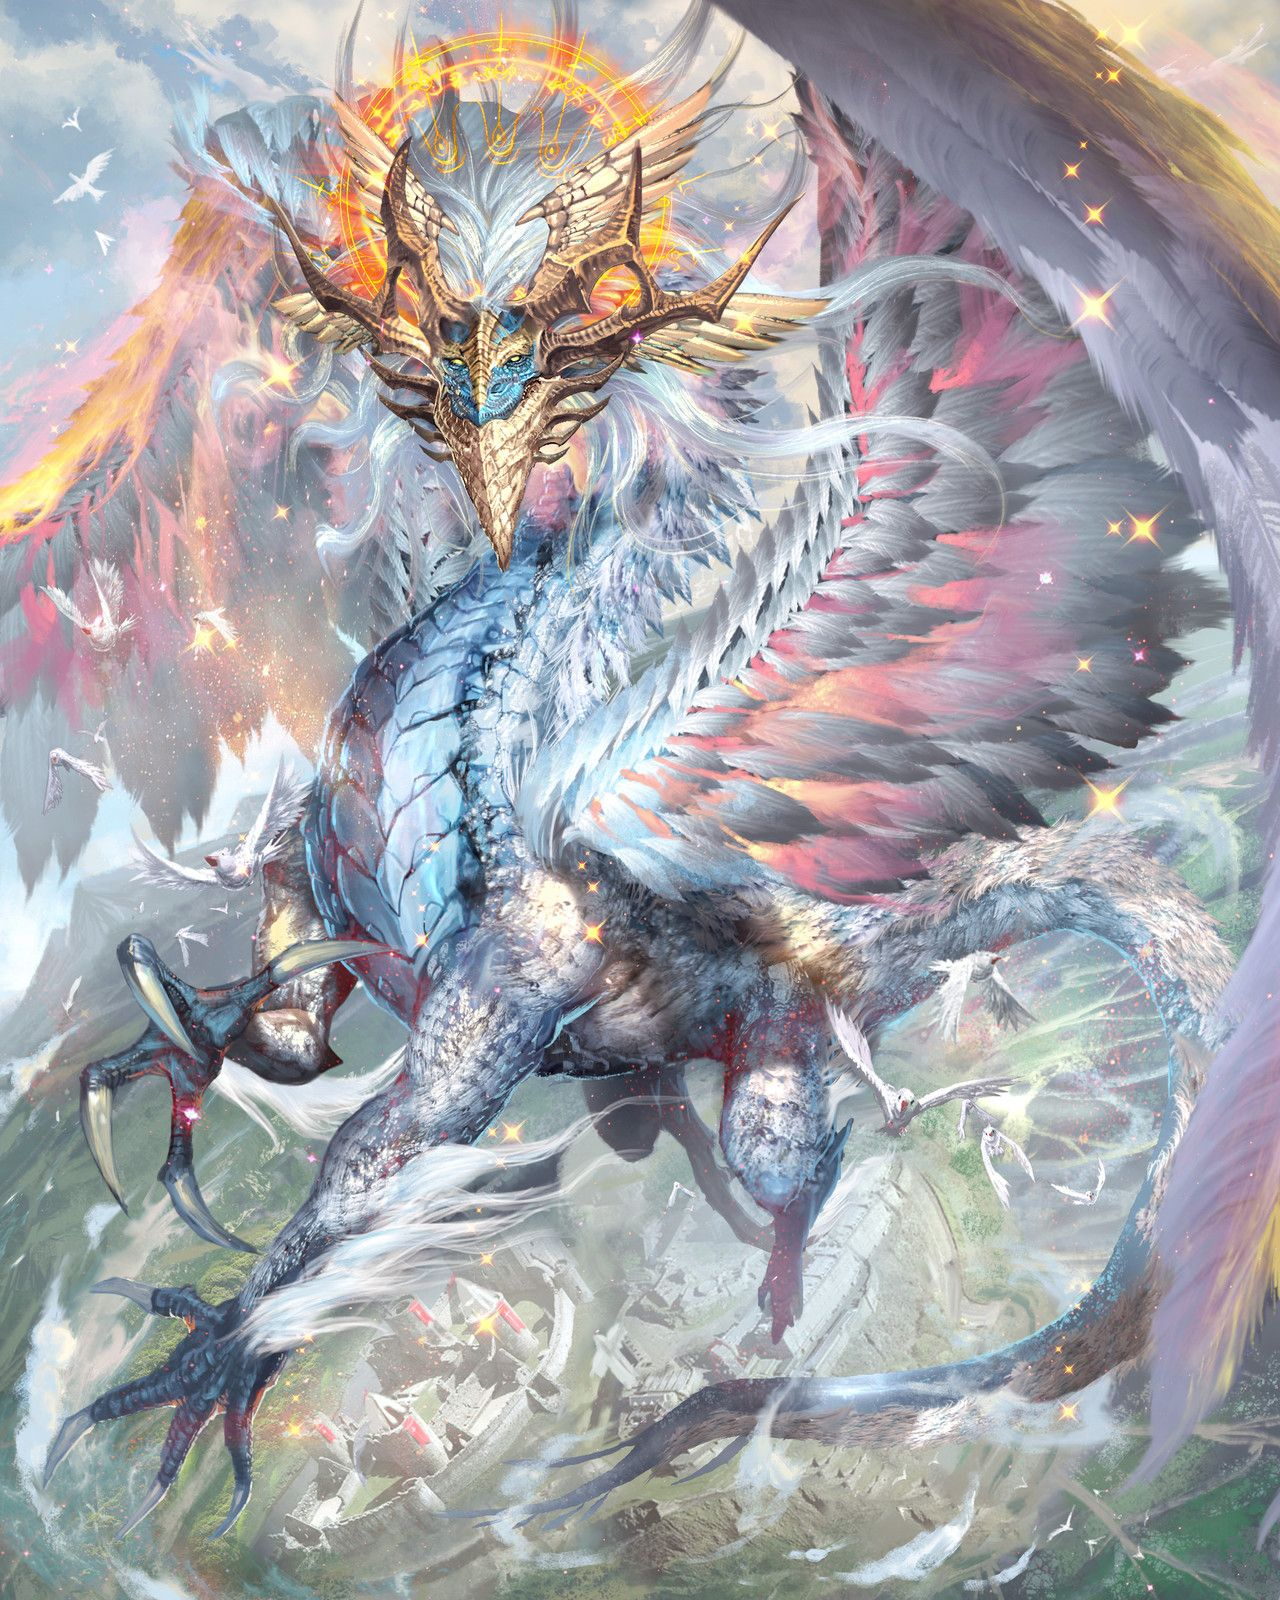 картинки фэнтези мистика драконы растения